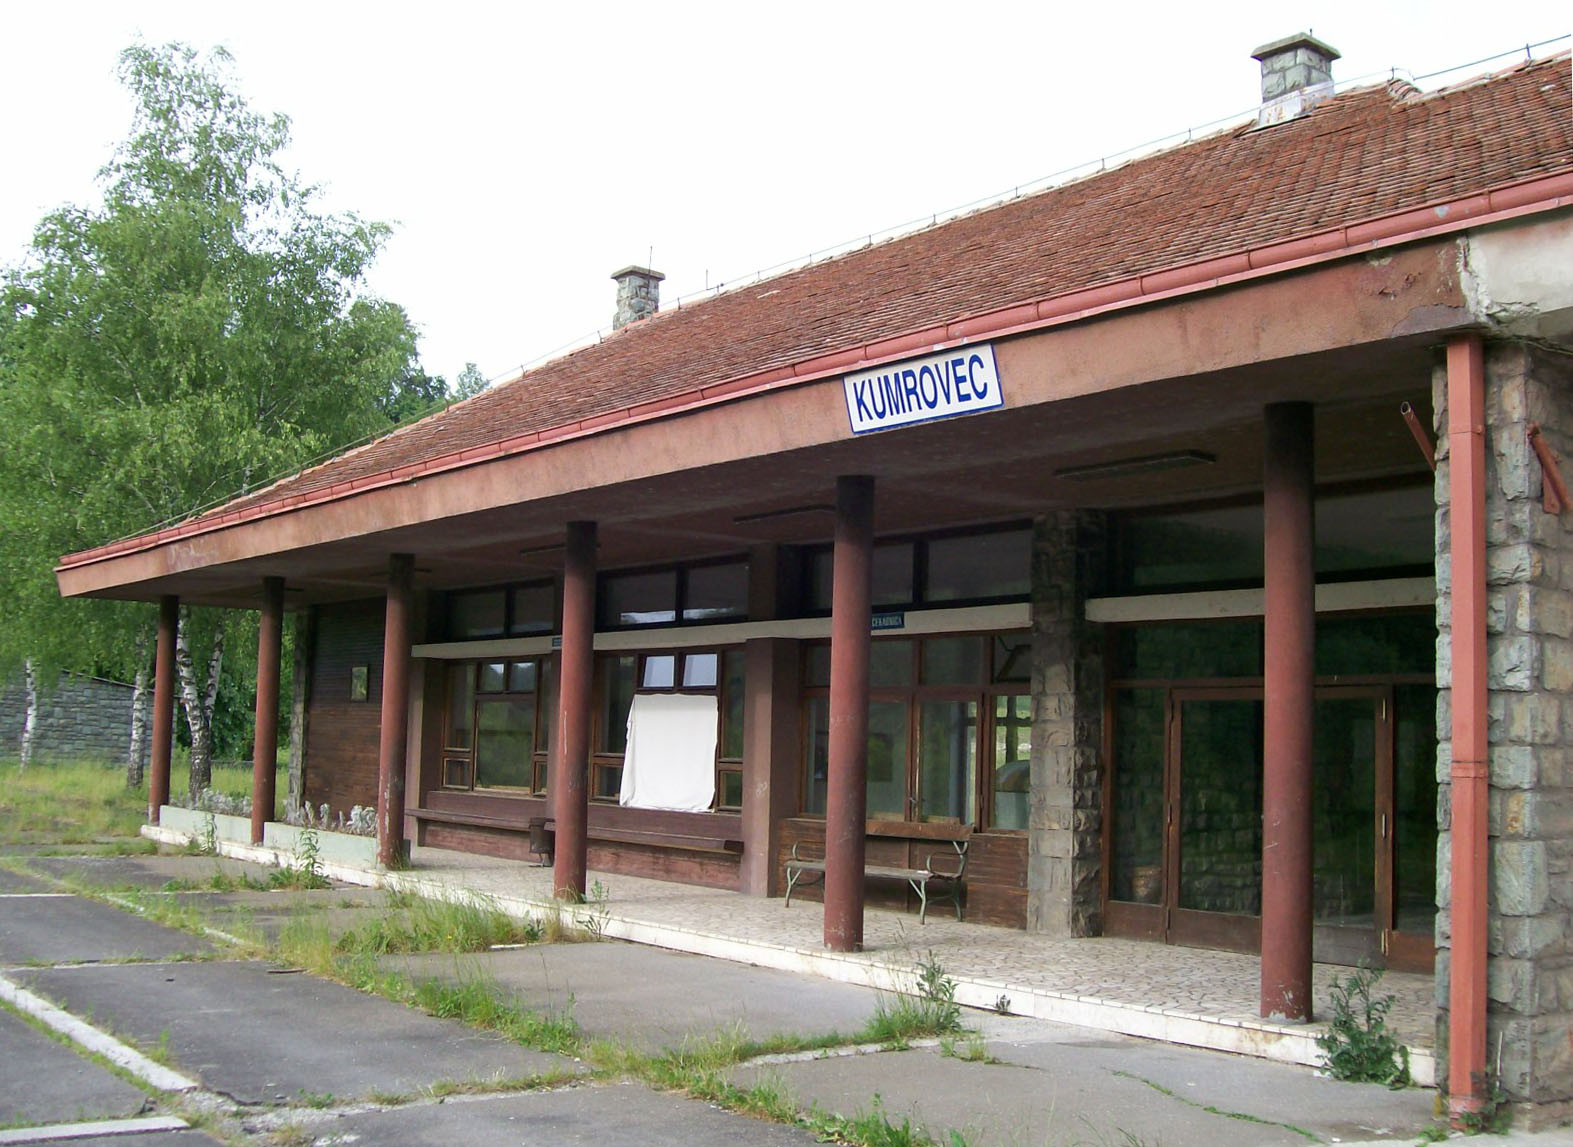 http://hrvatskifokus-2021.ga/wp-content/uploads/2019/11/Kumrovec_zeljeznicka_stanica.jpg